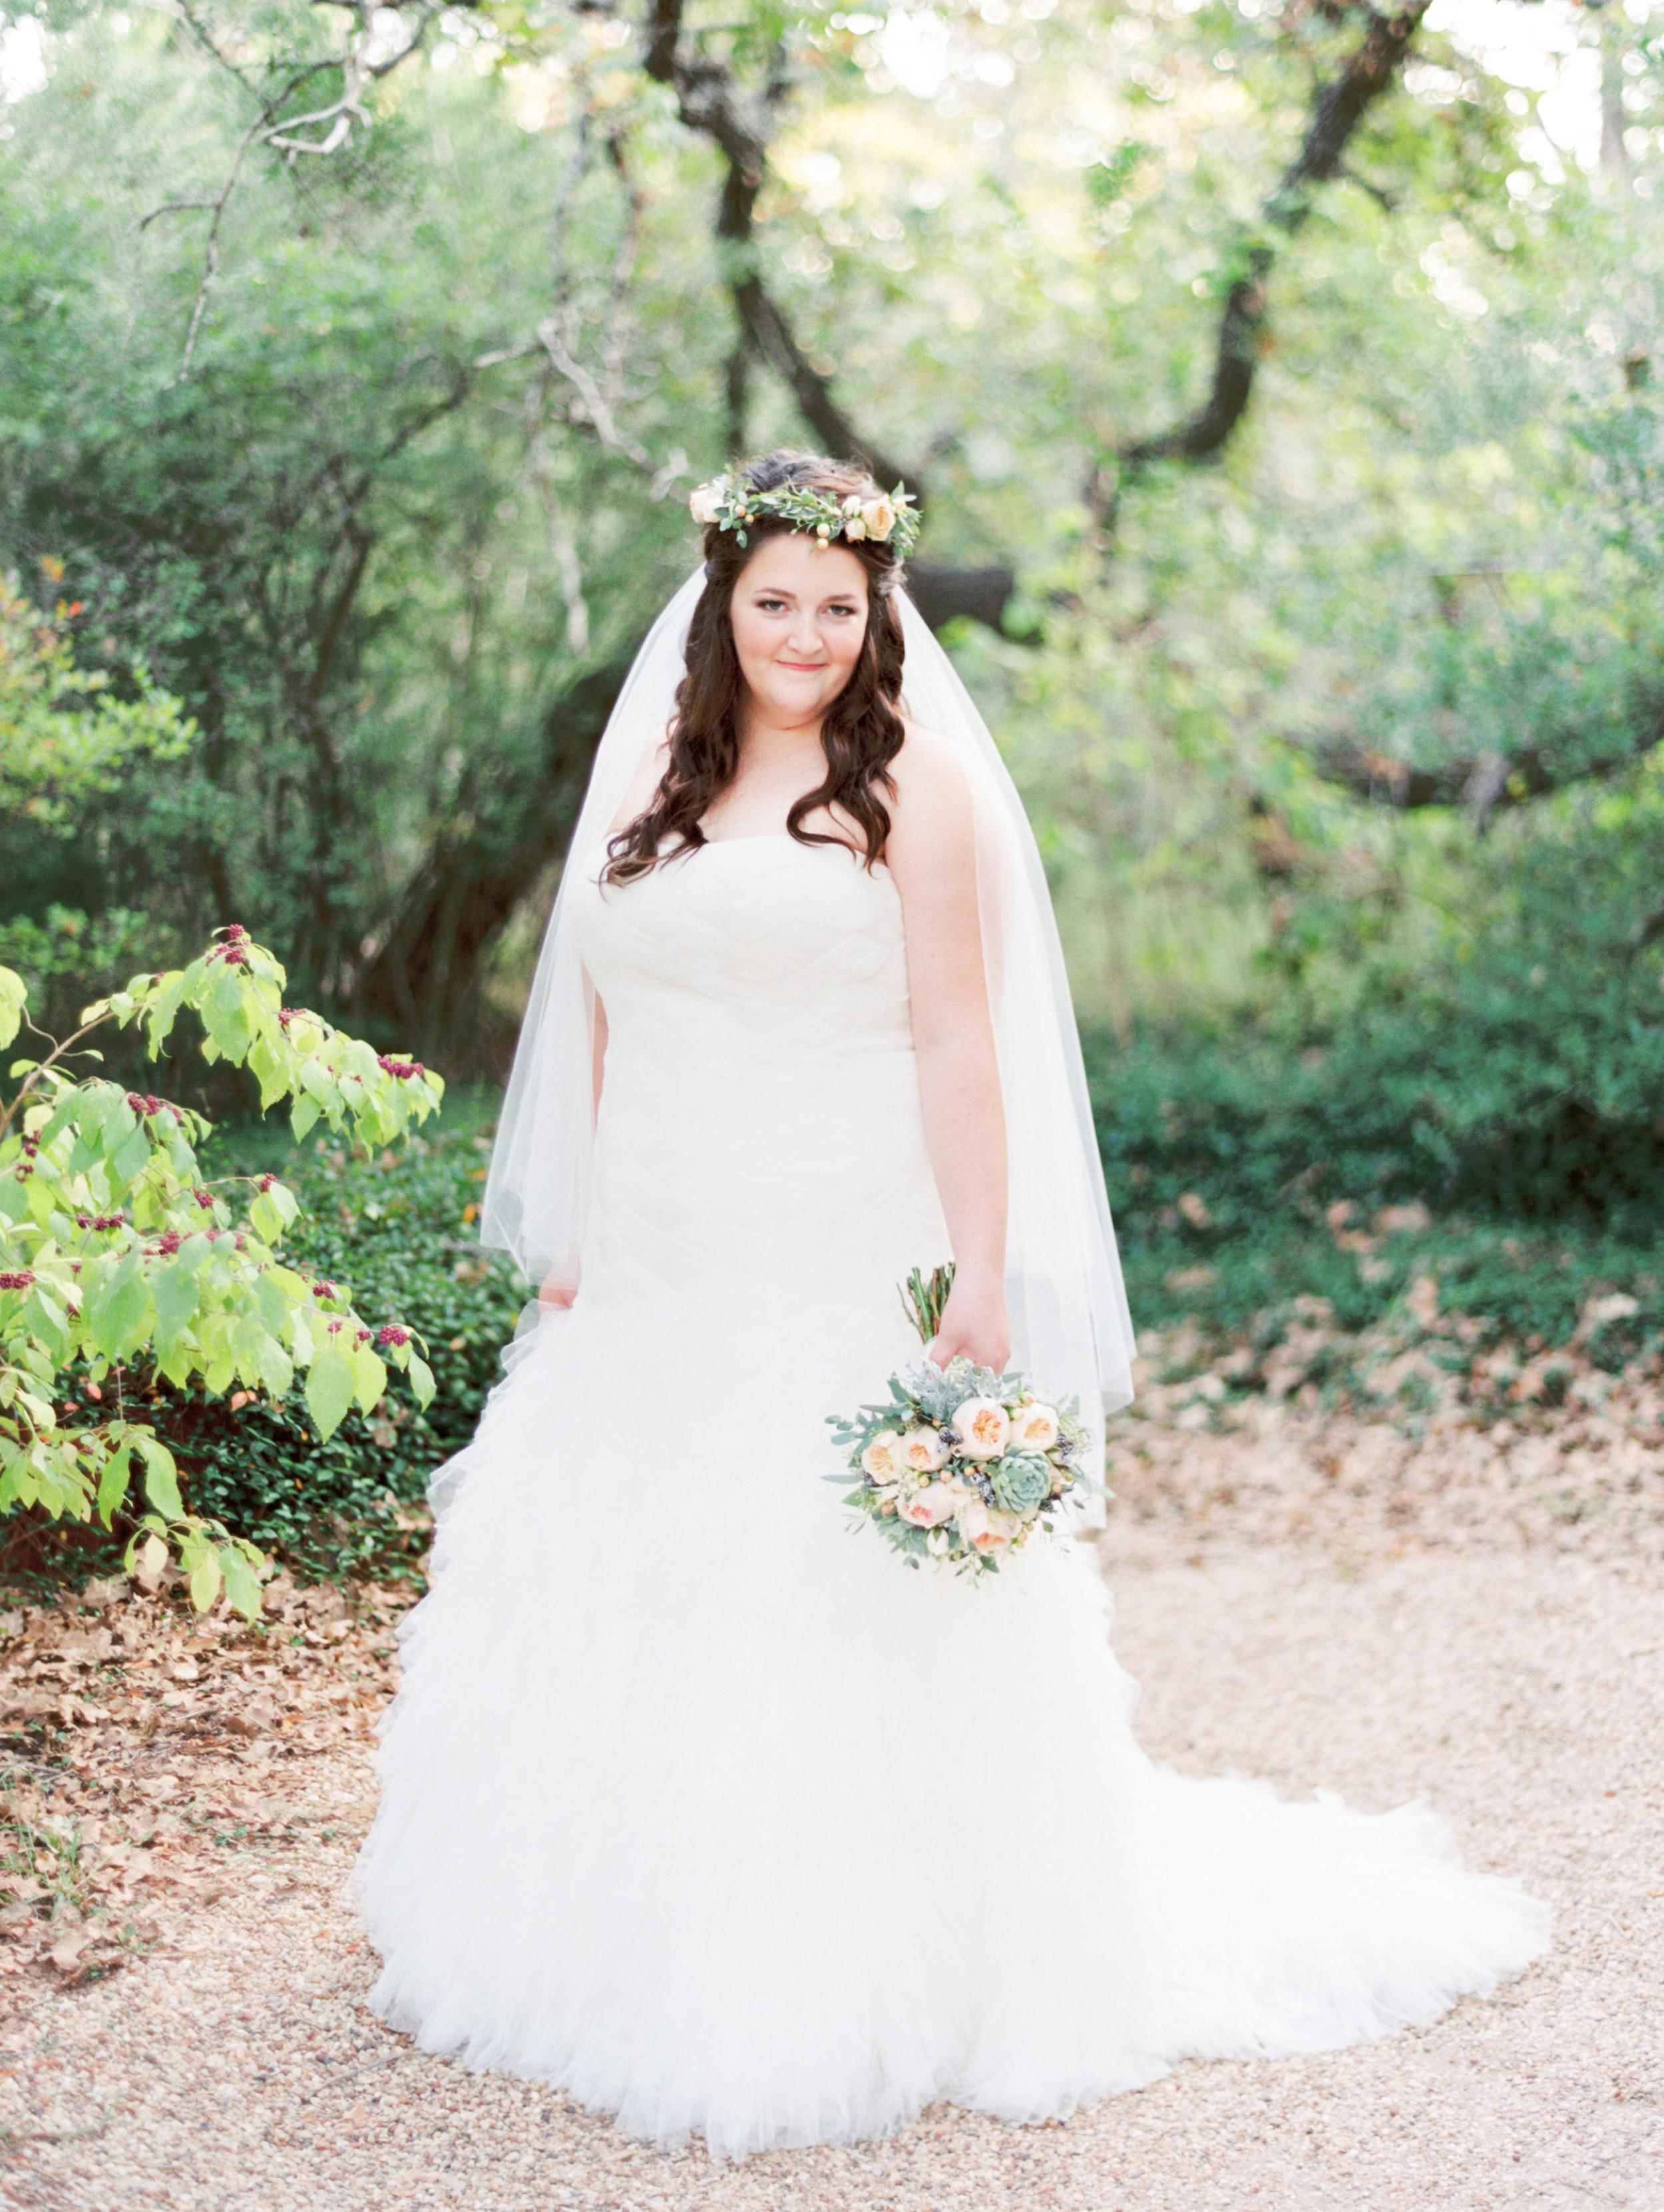 Sarah Best Photography - Elizabeth's Bridals - 7F Lodge-122.jpg